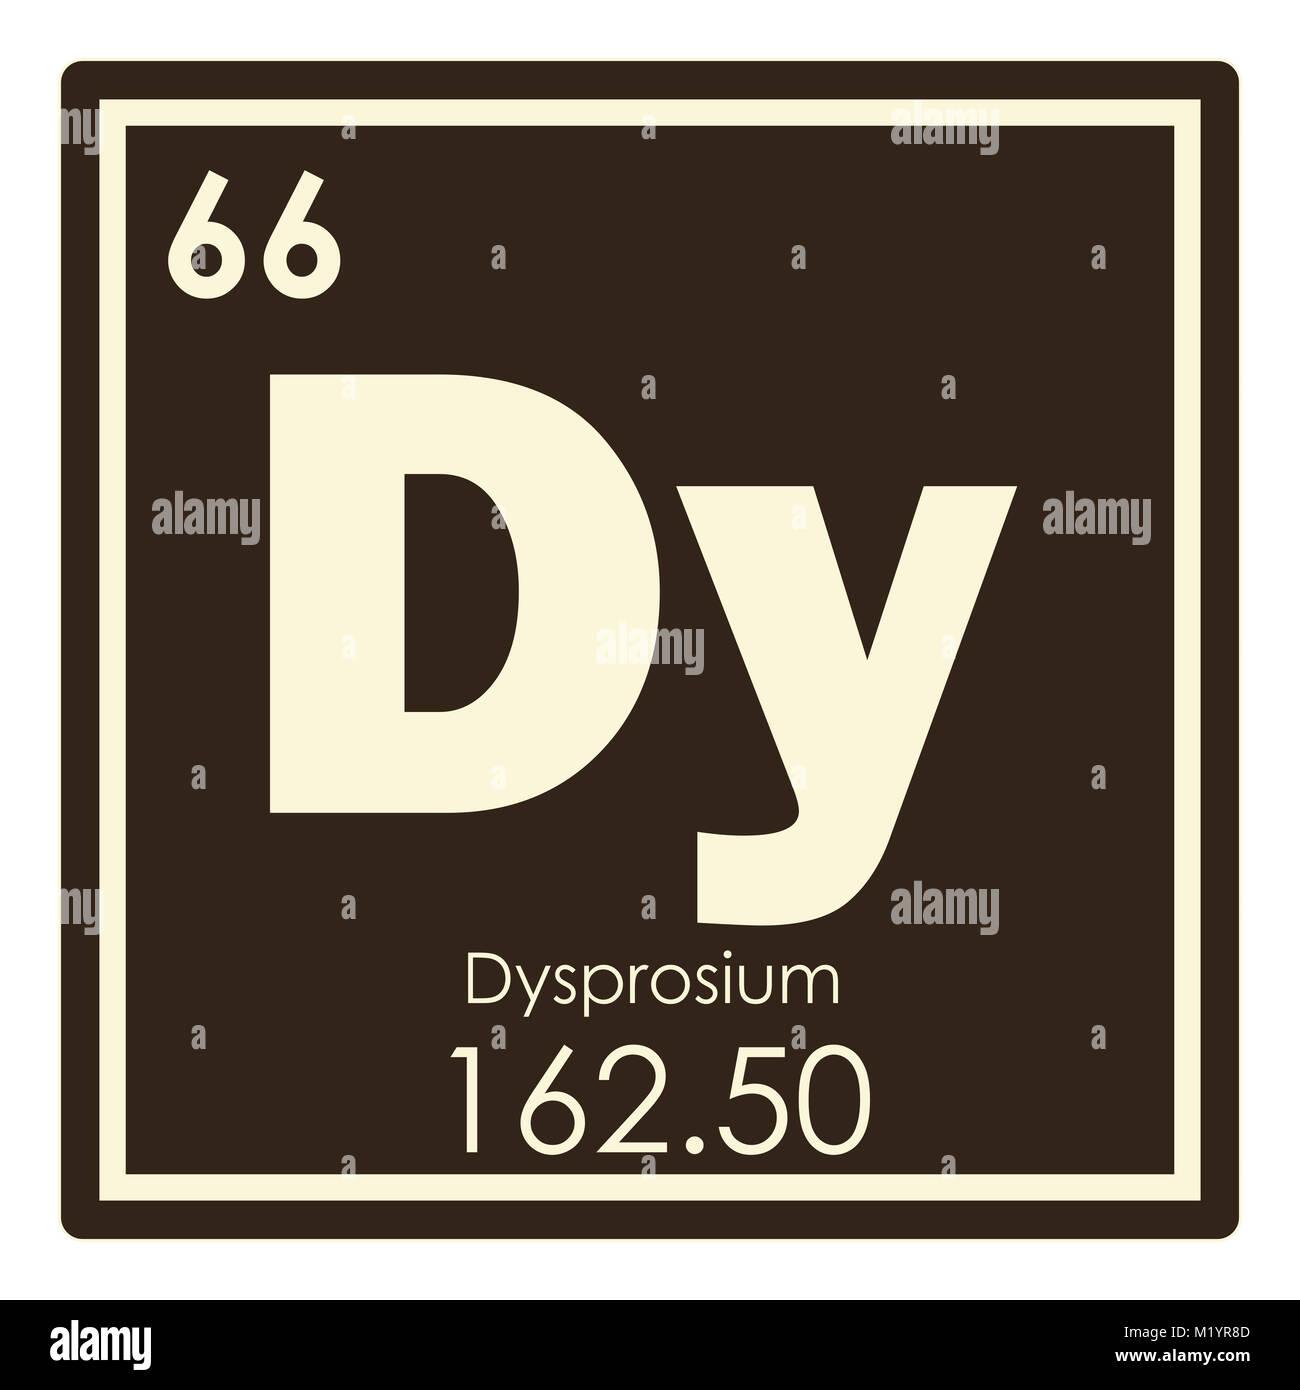 Dysprosium Chemical Element Stock Photos Dysprosium Chemical